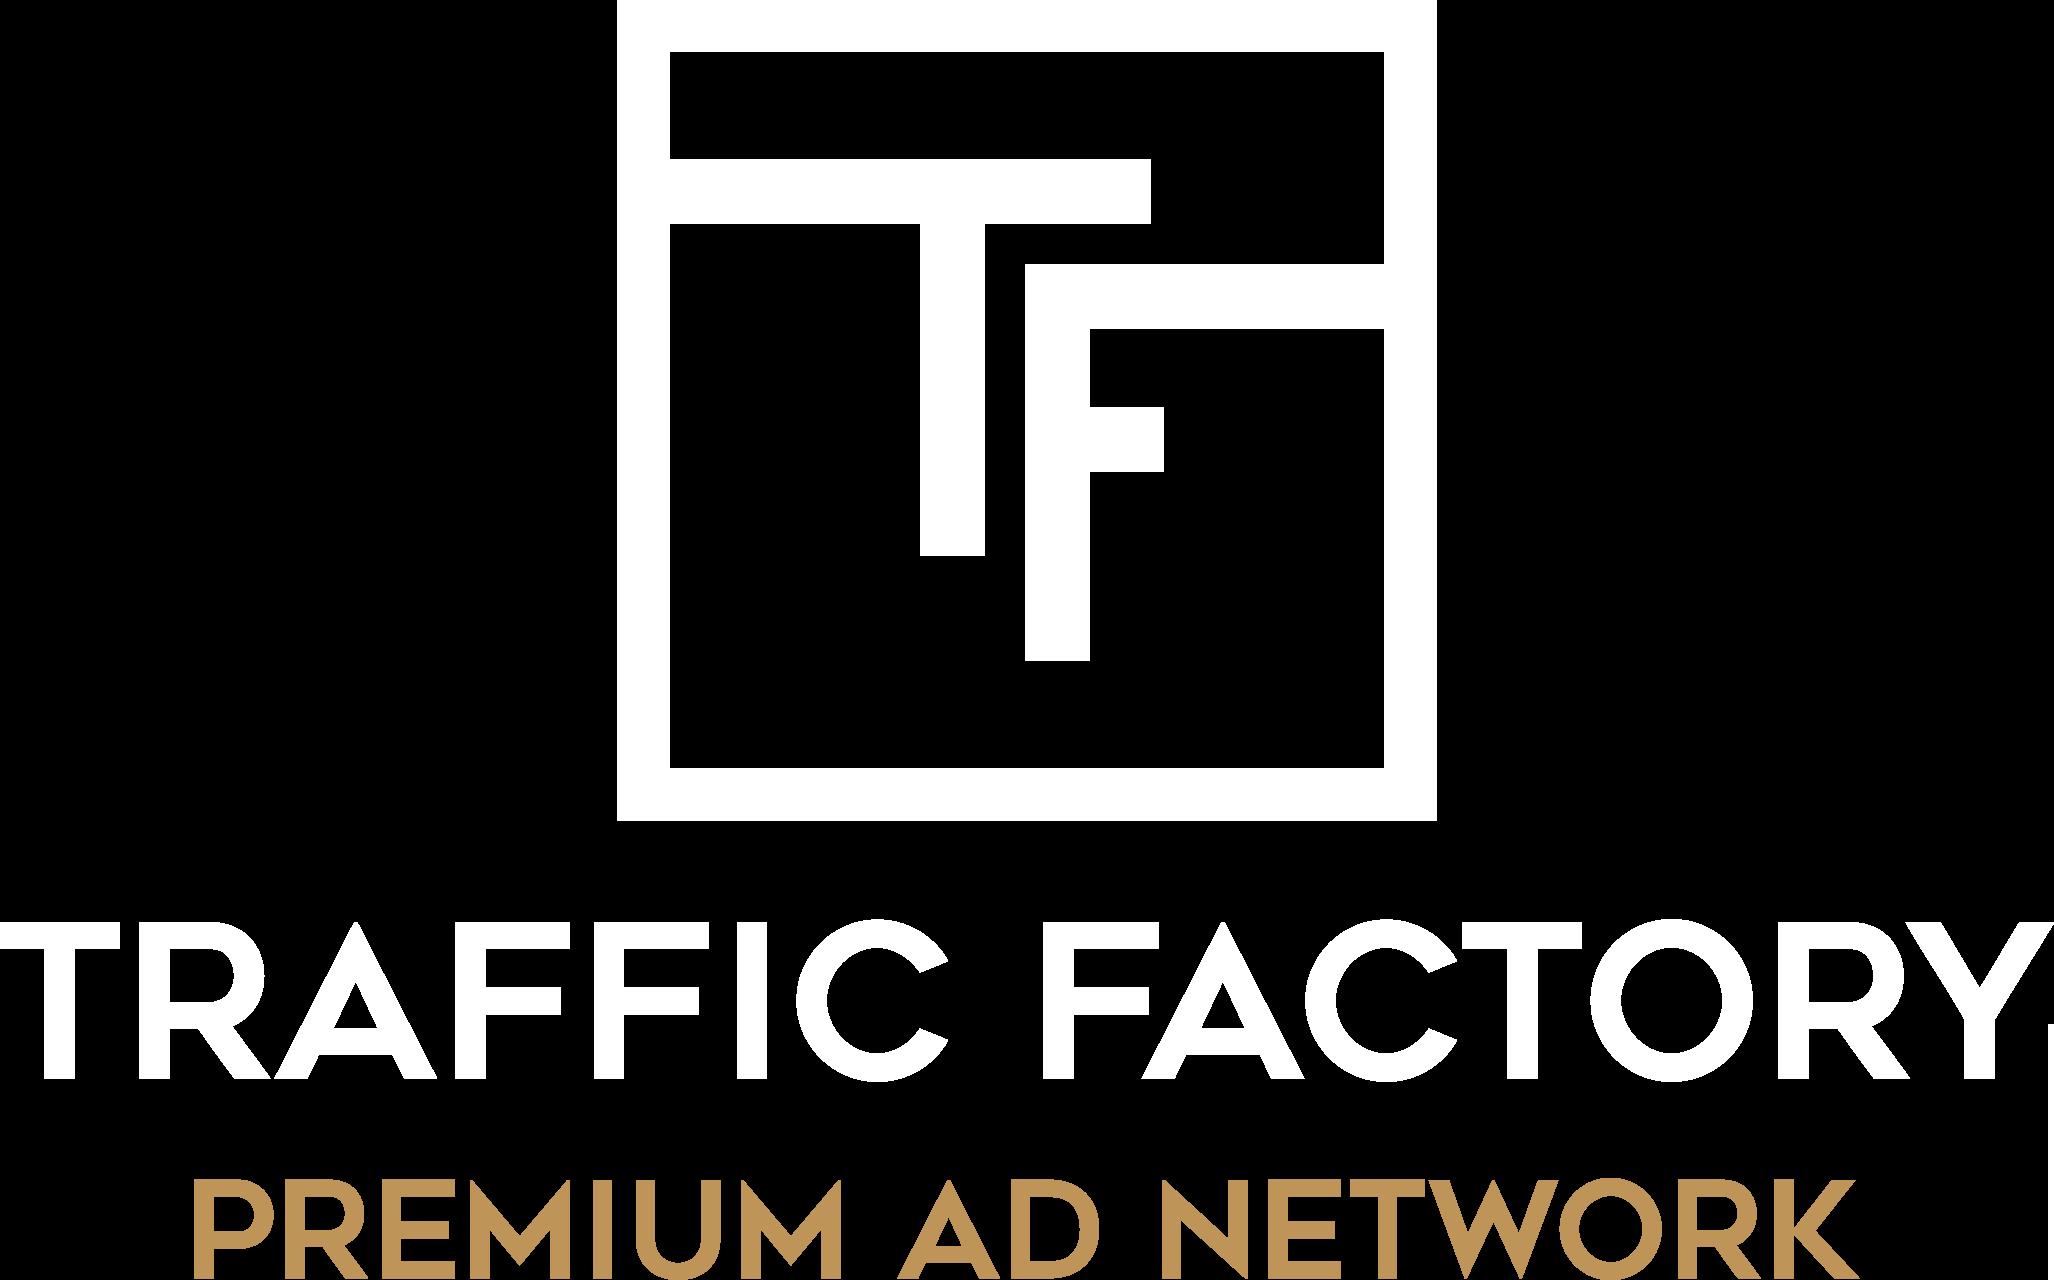 logo-tfactory